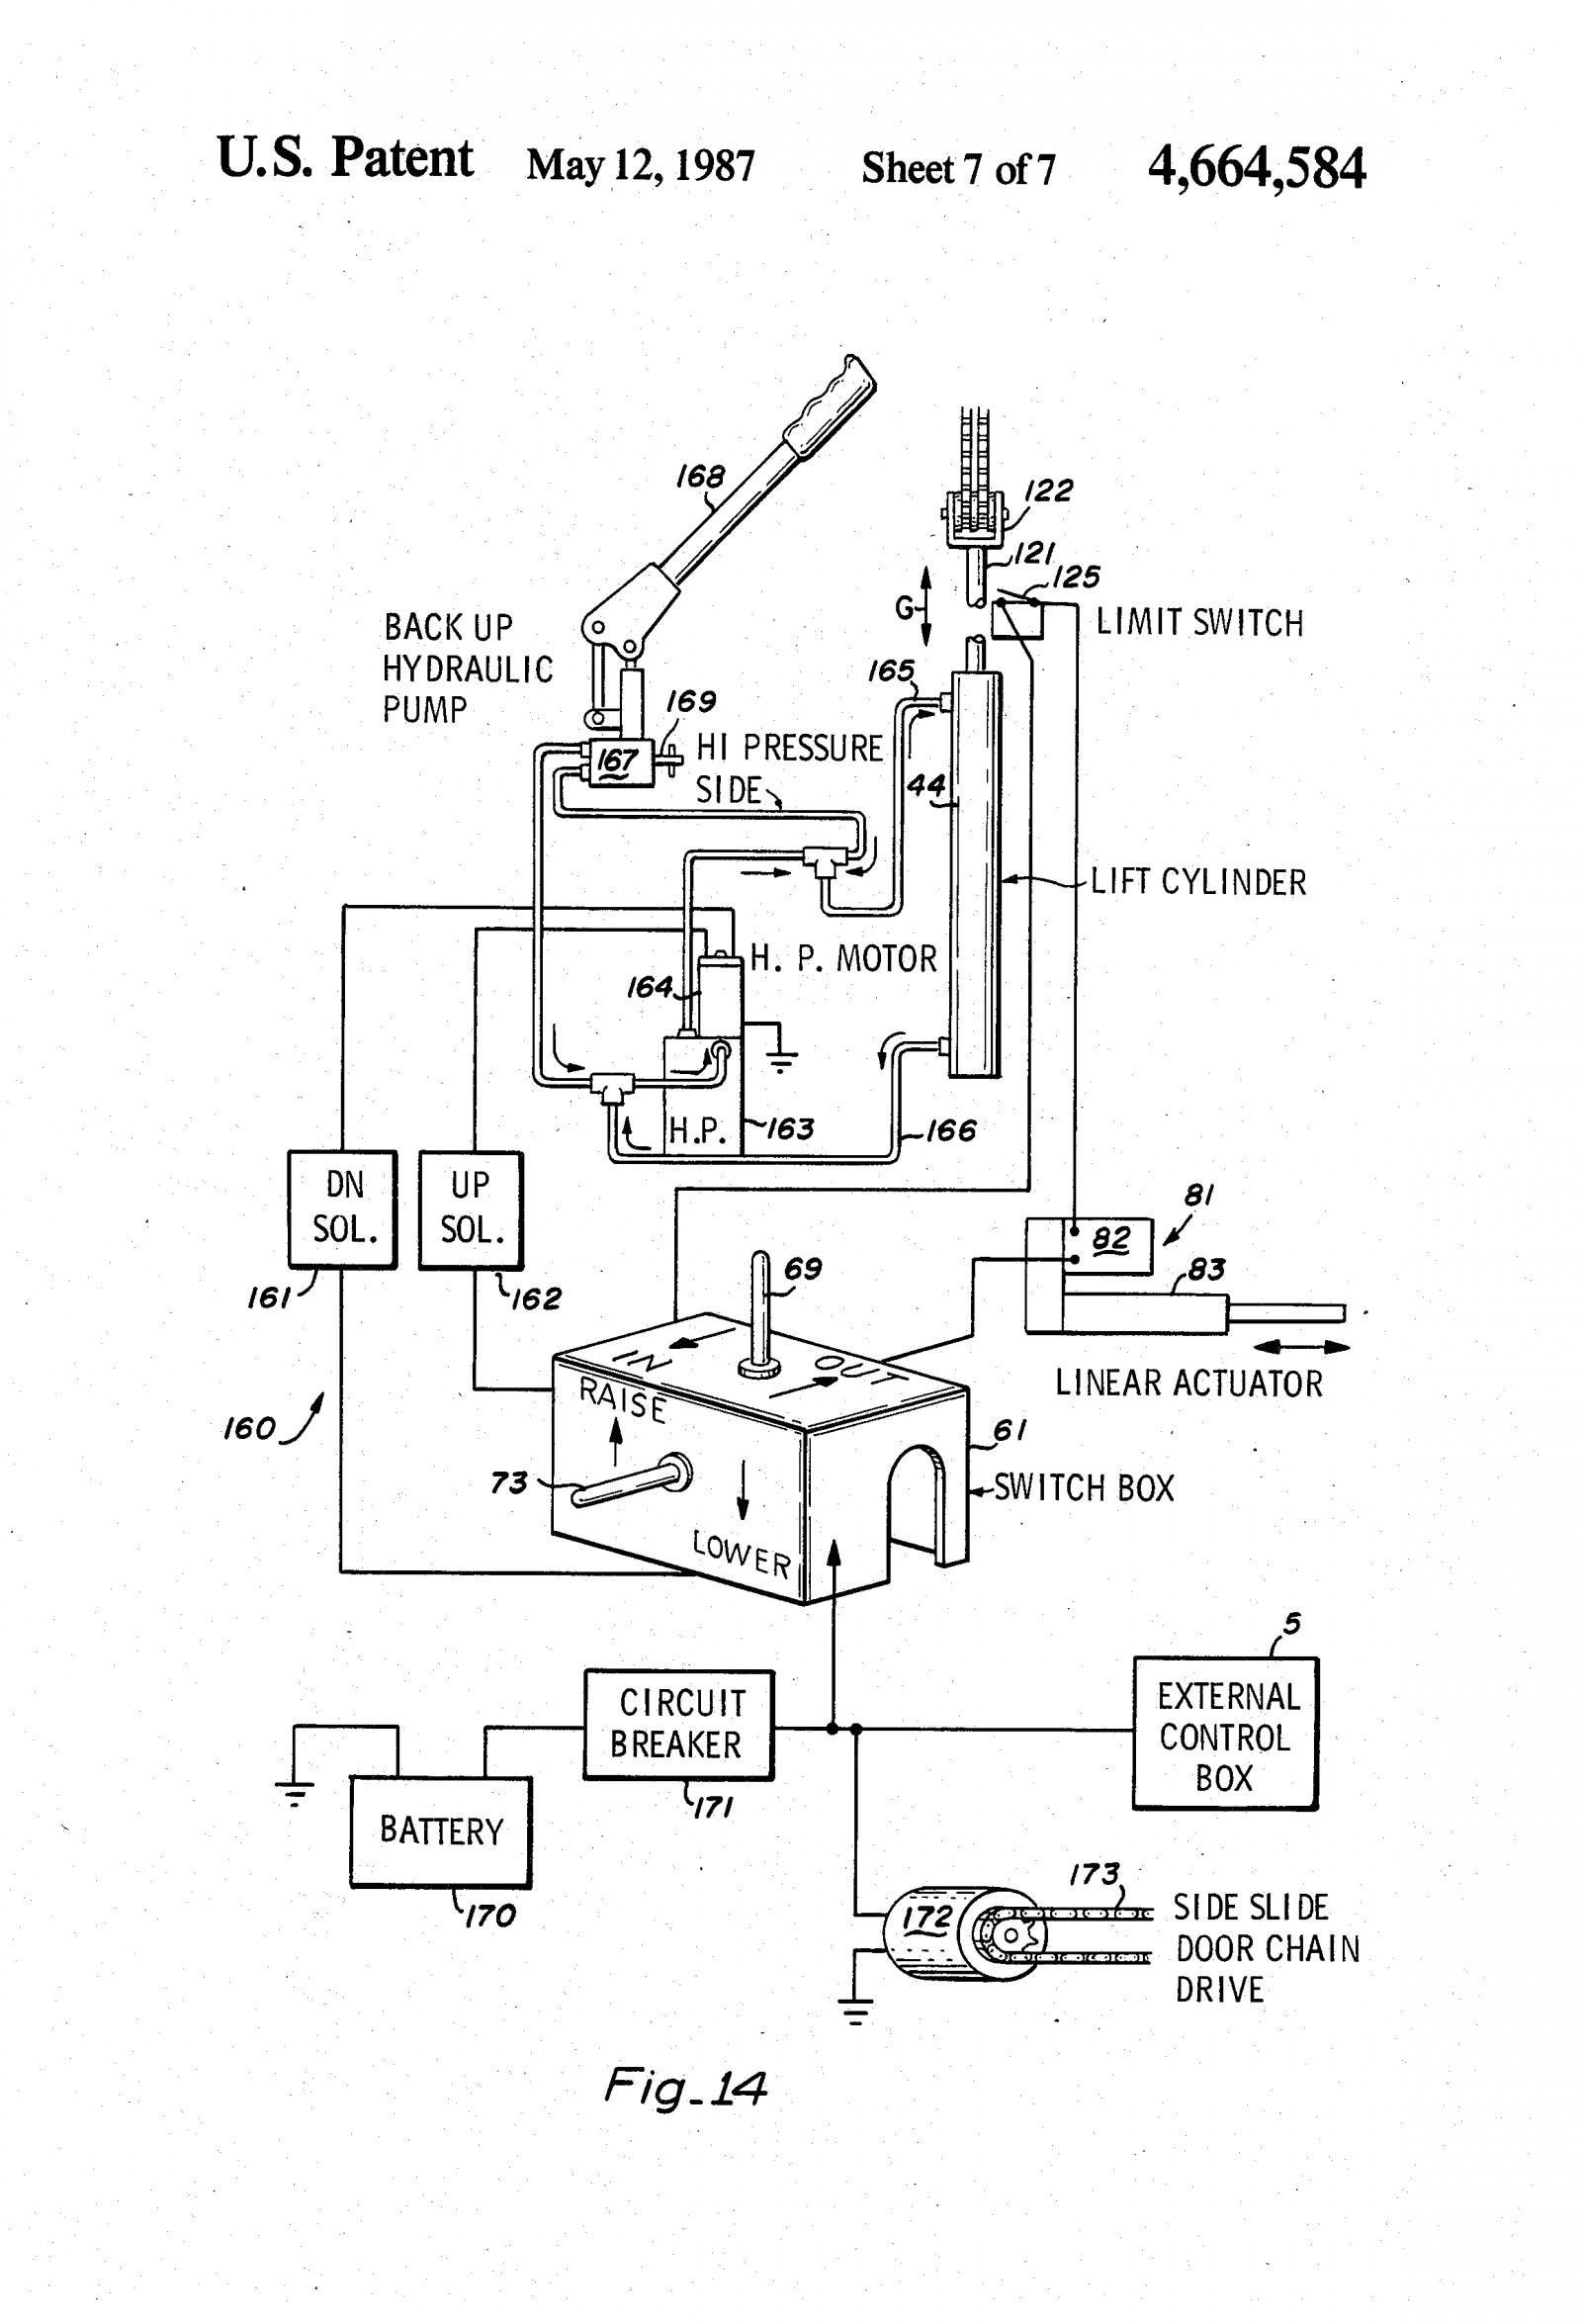 Upright Scissor Lift Wiring Diagram